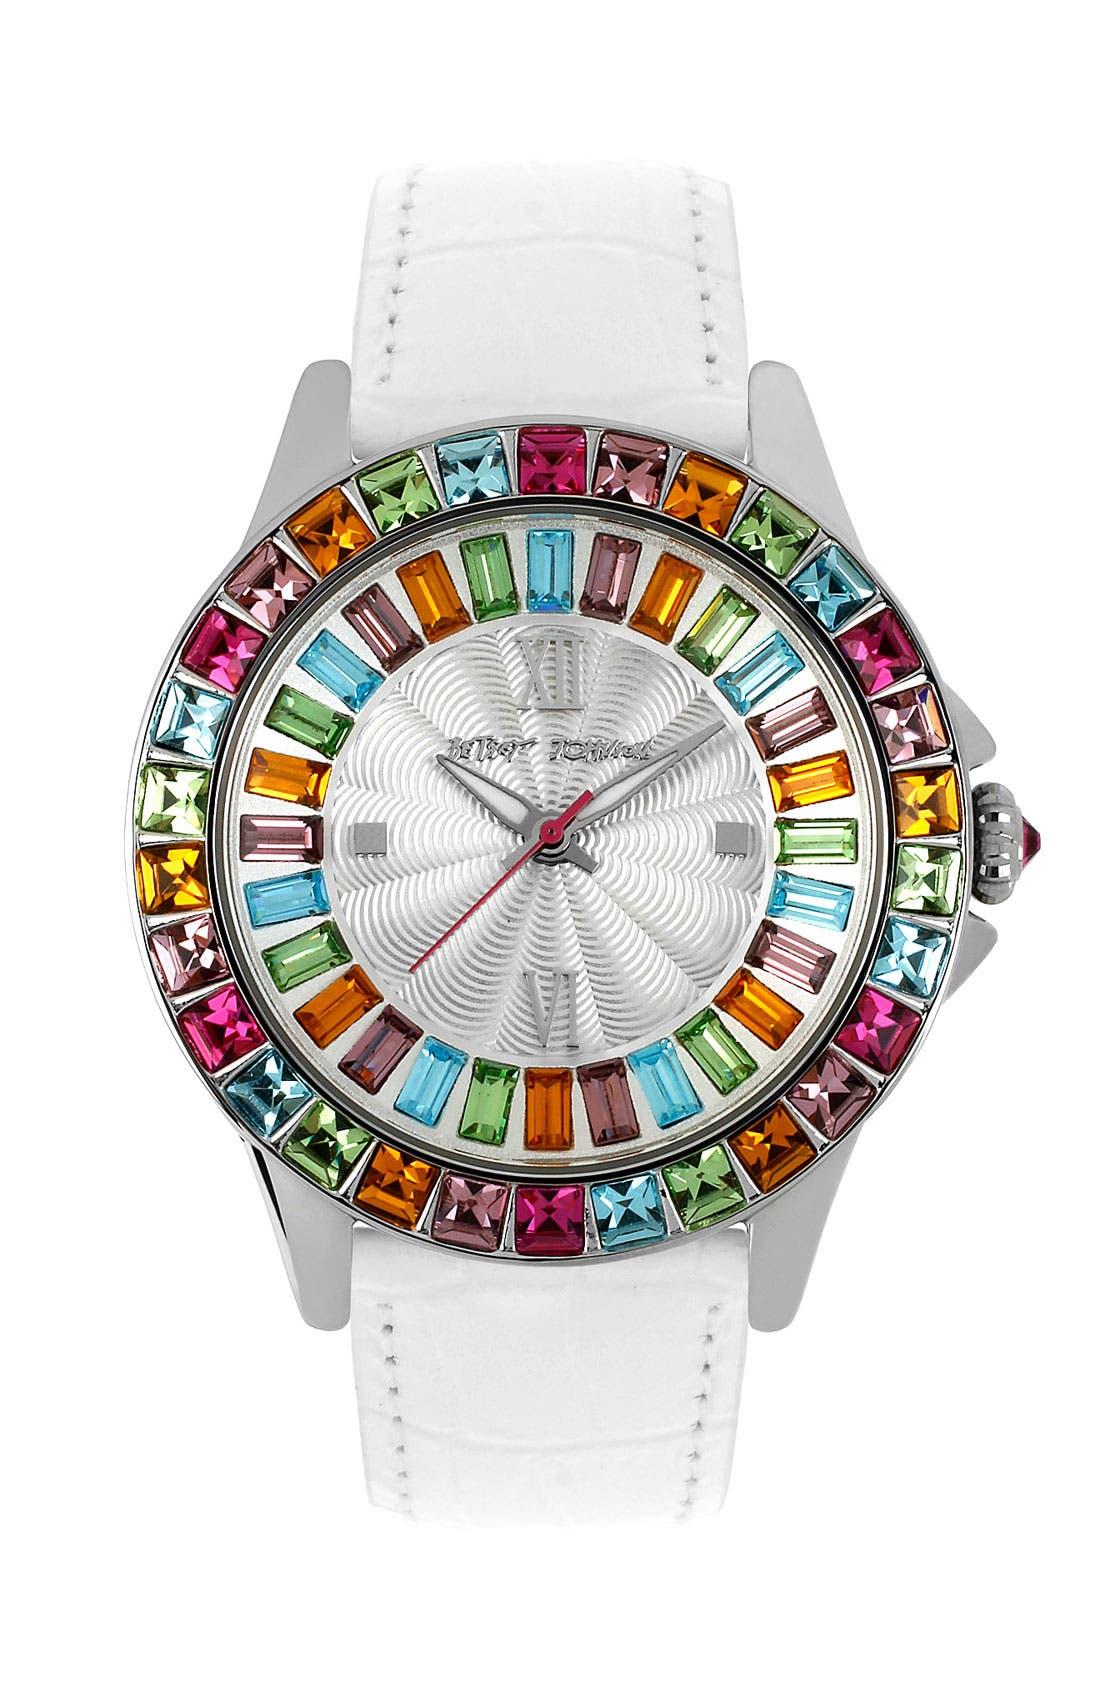 Main Image - Betsey Johnson Multicolored Crystal Bezel Watch, 40mm